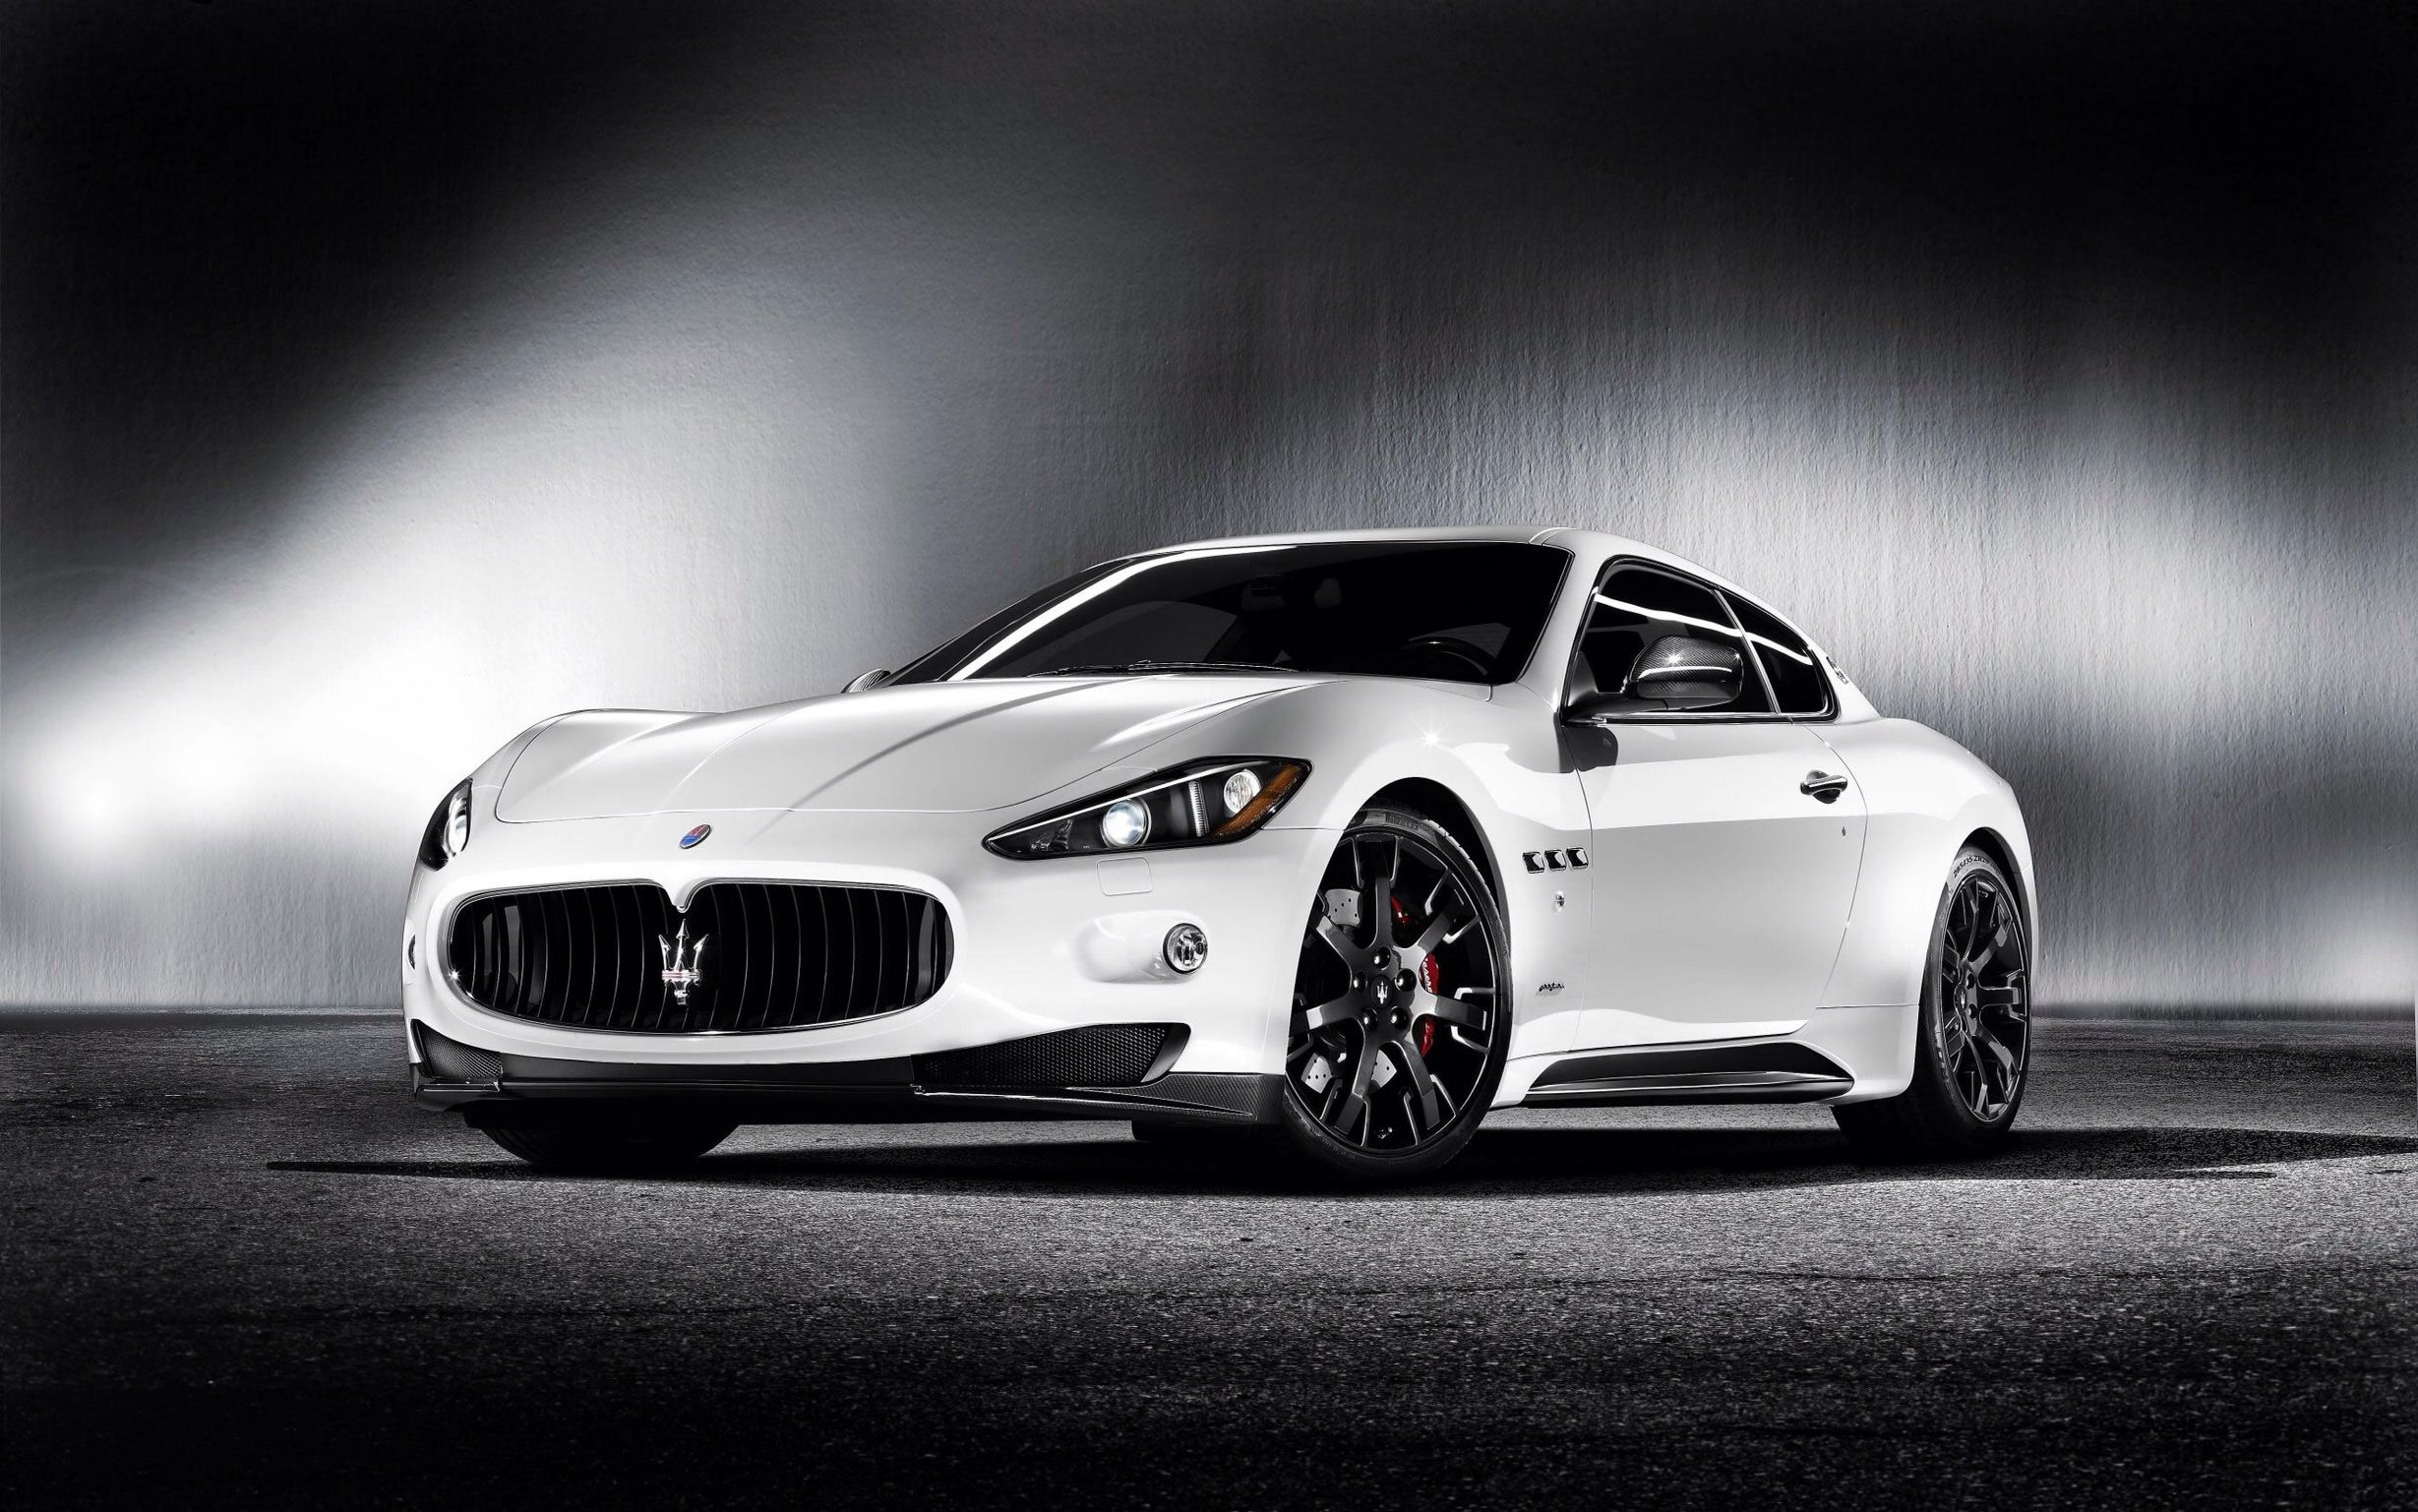 Maserati Granturismo S Mc Sport Line Maserati Granturismo Maserati Granturismo S Maserati